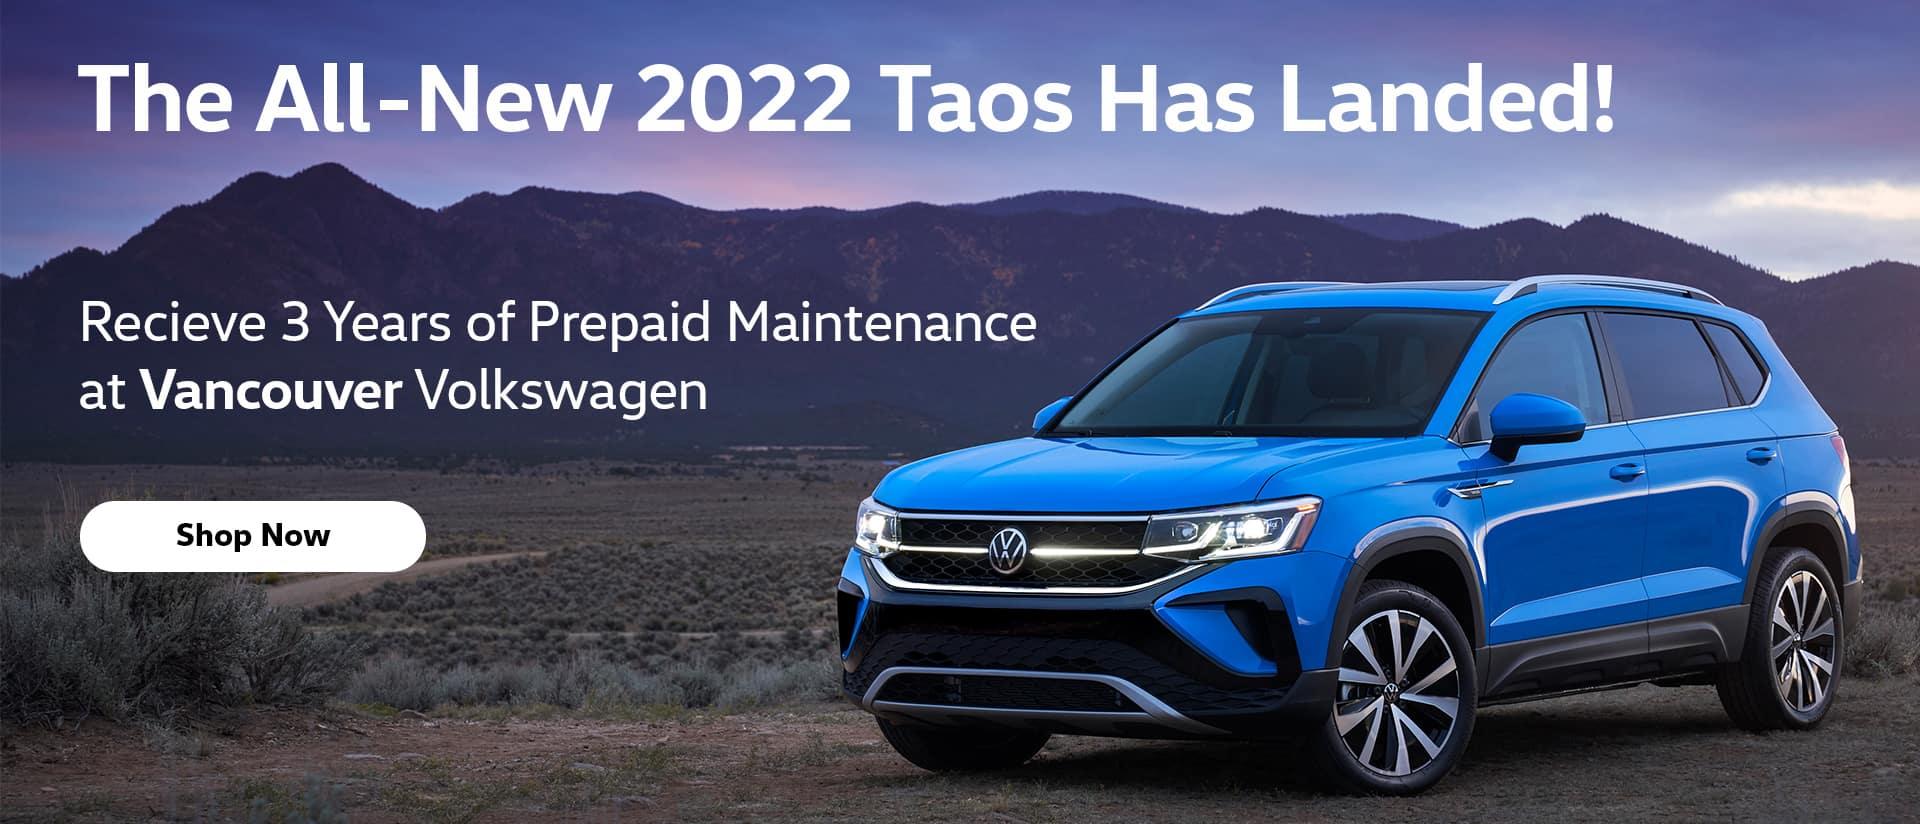 The All-New 2022 Taos_Desktop_Banner